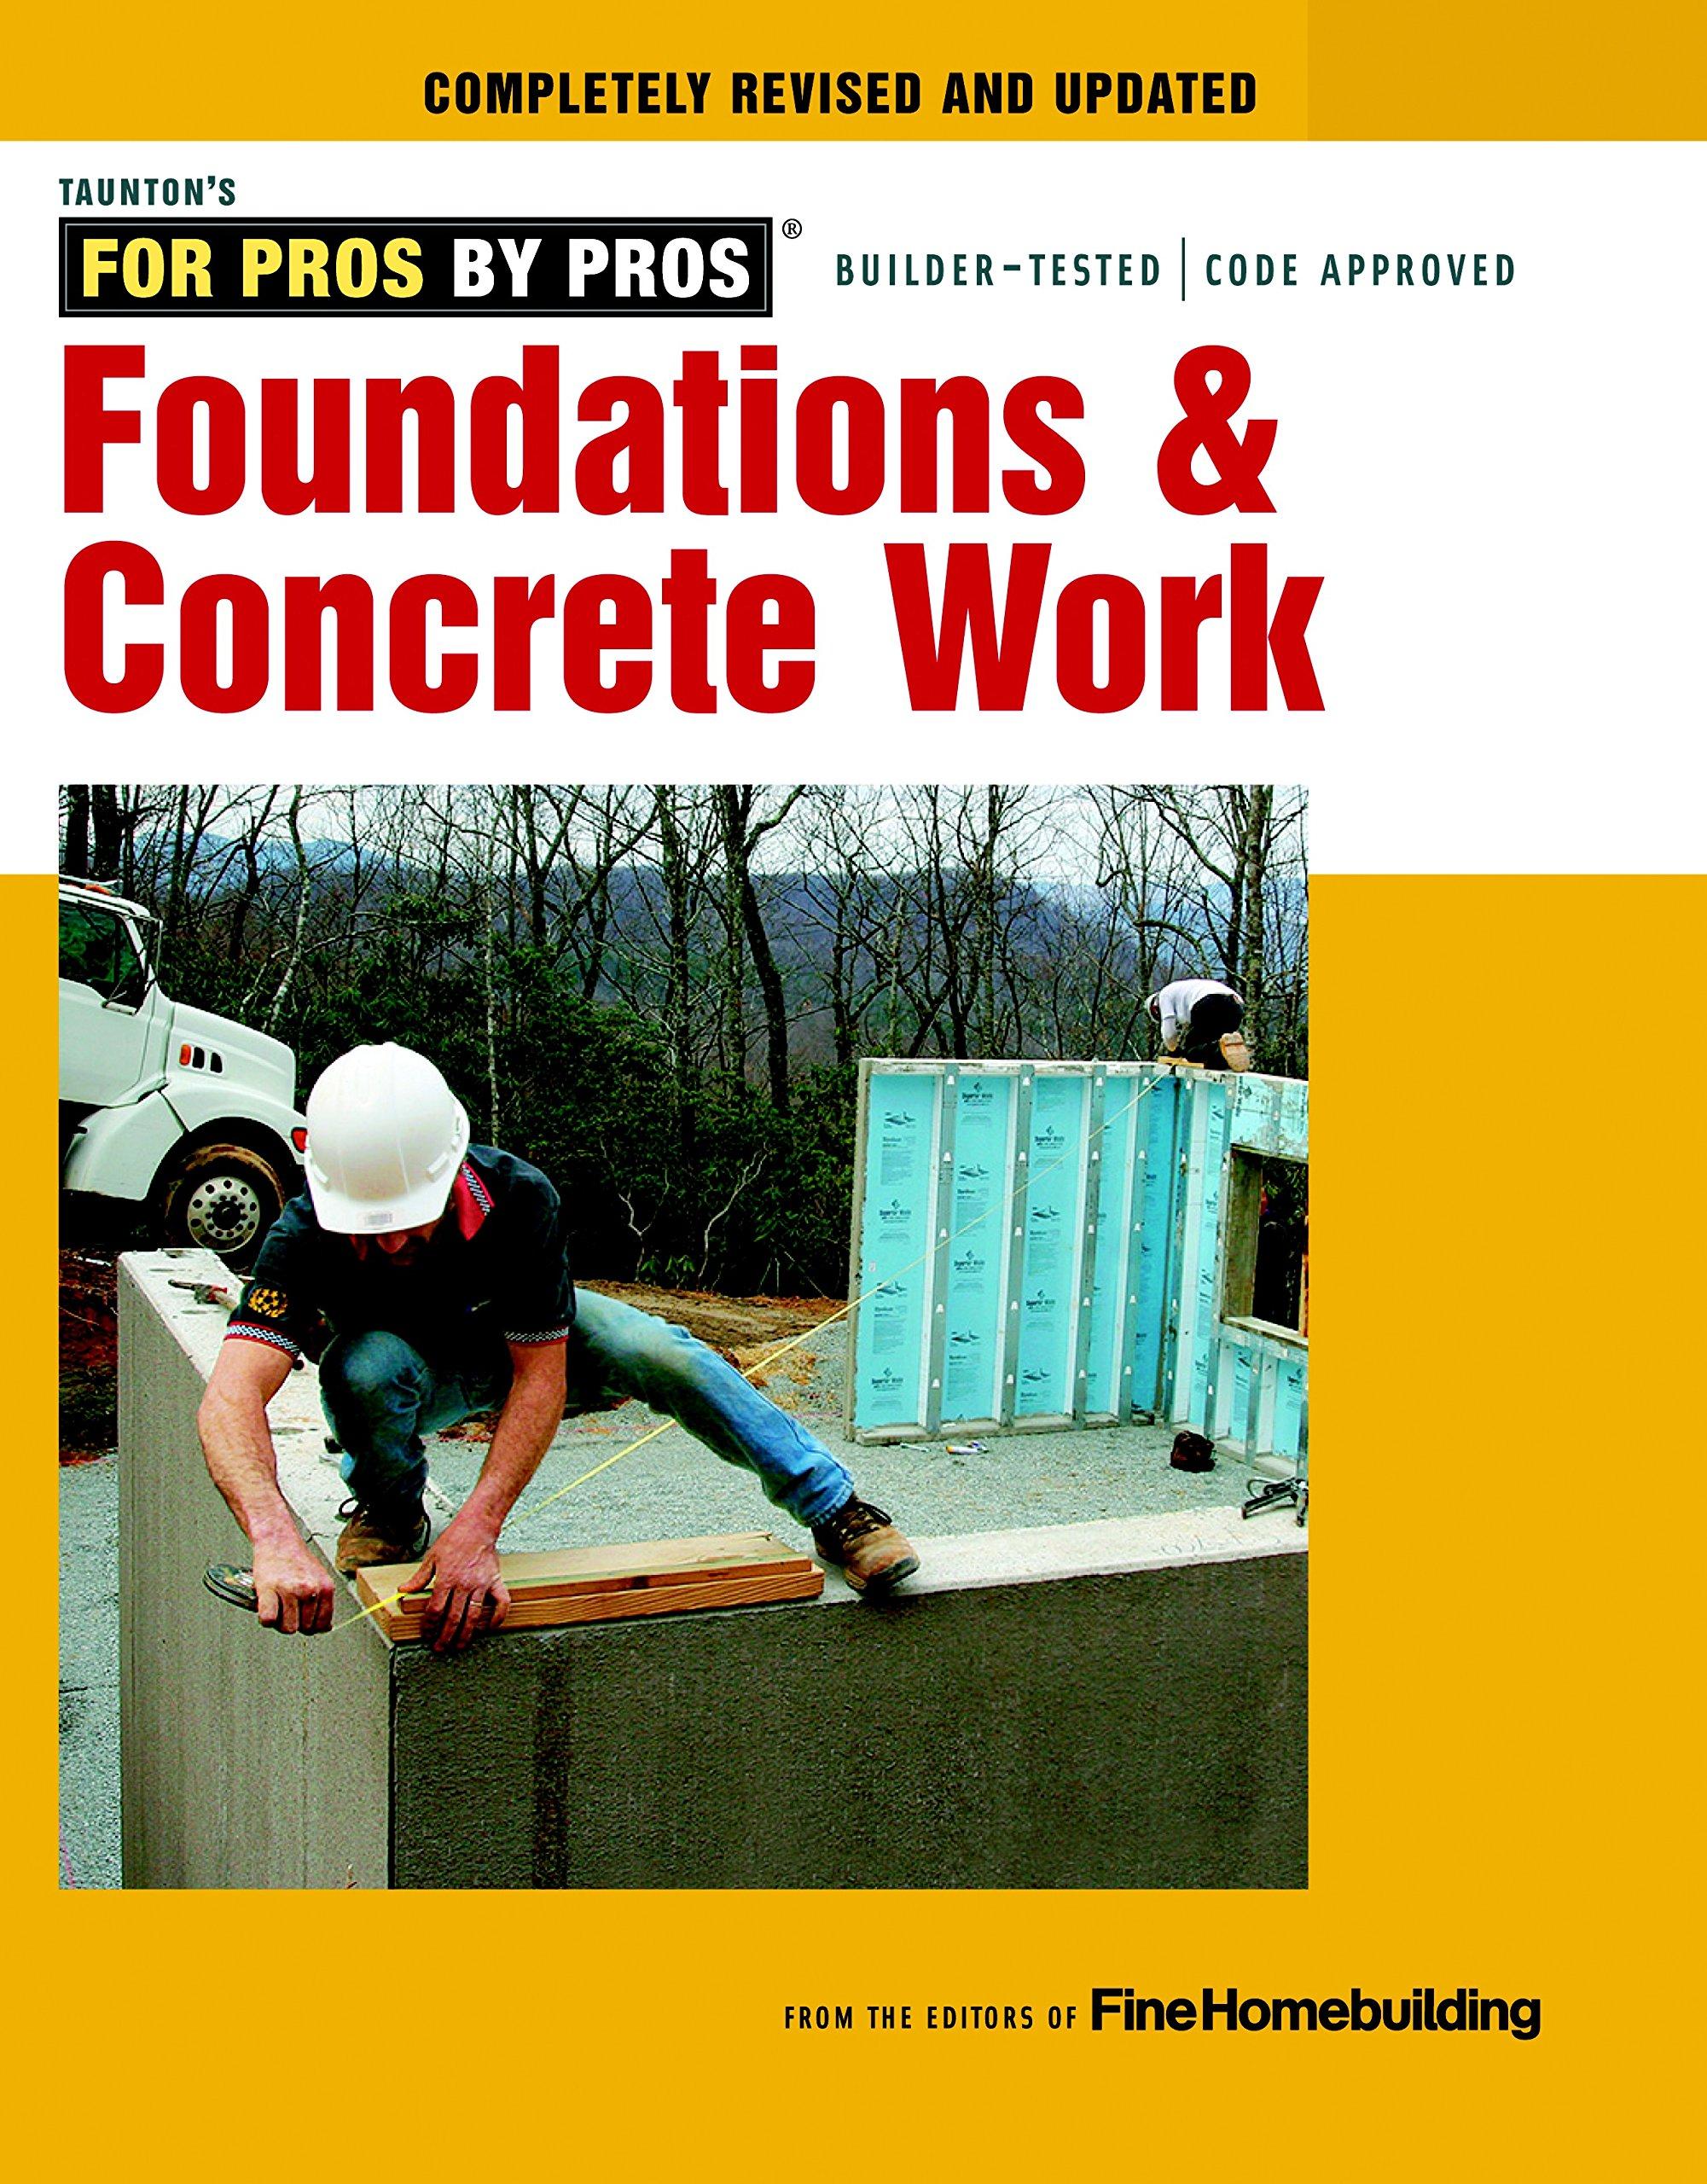 amazon com fine homebuilding books biography blog audiobooks